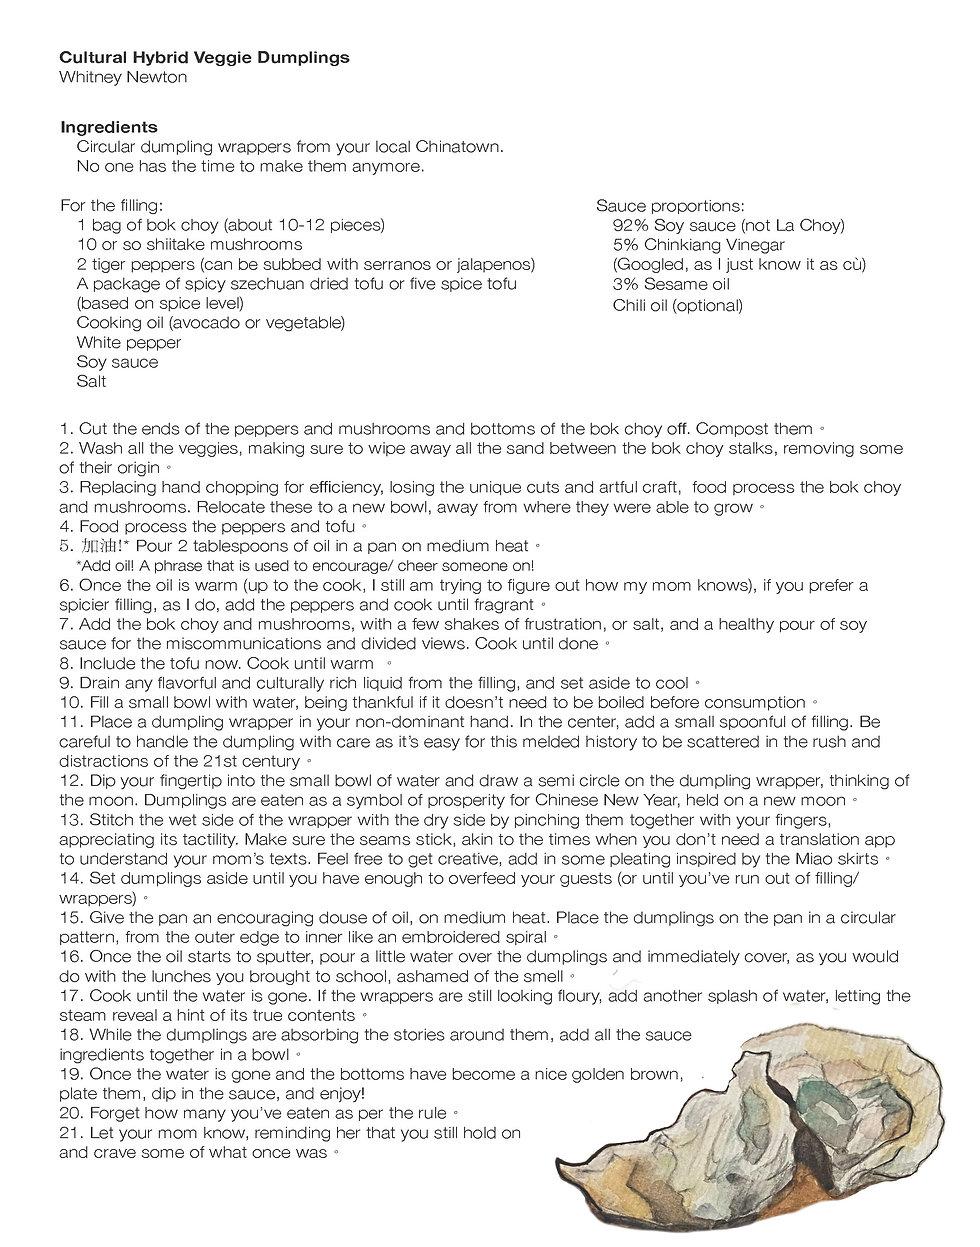 Cultural Hybrid Veggie Dumpling Recipe - Whitney_Page_2.jpg